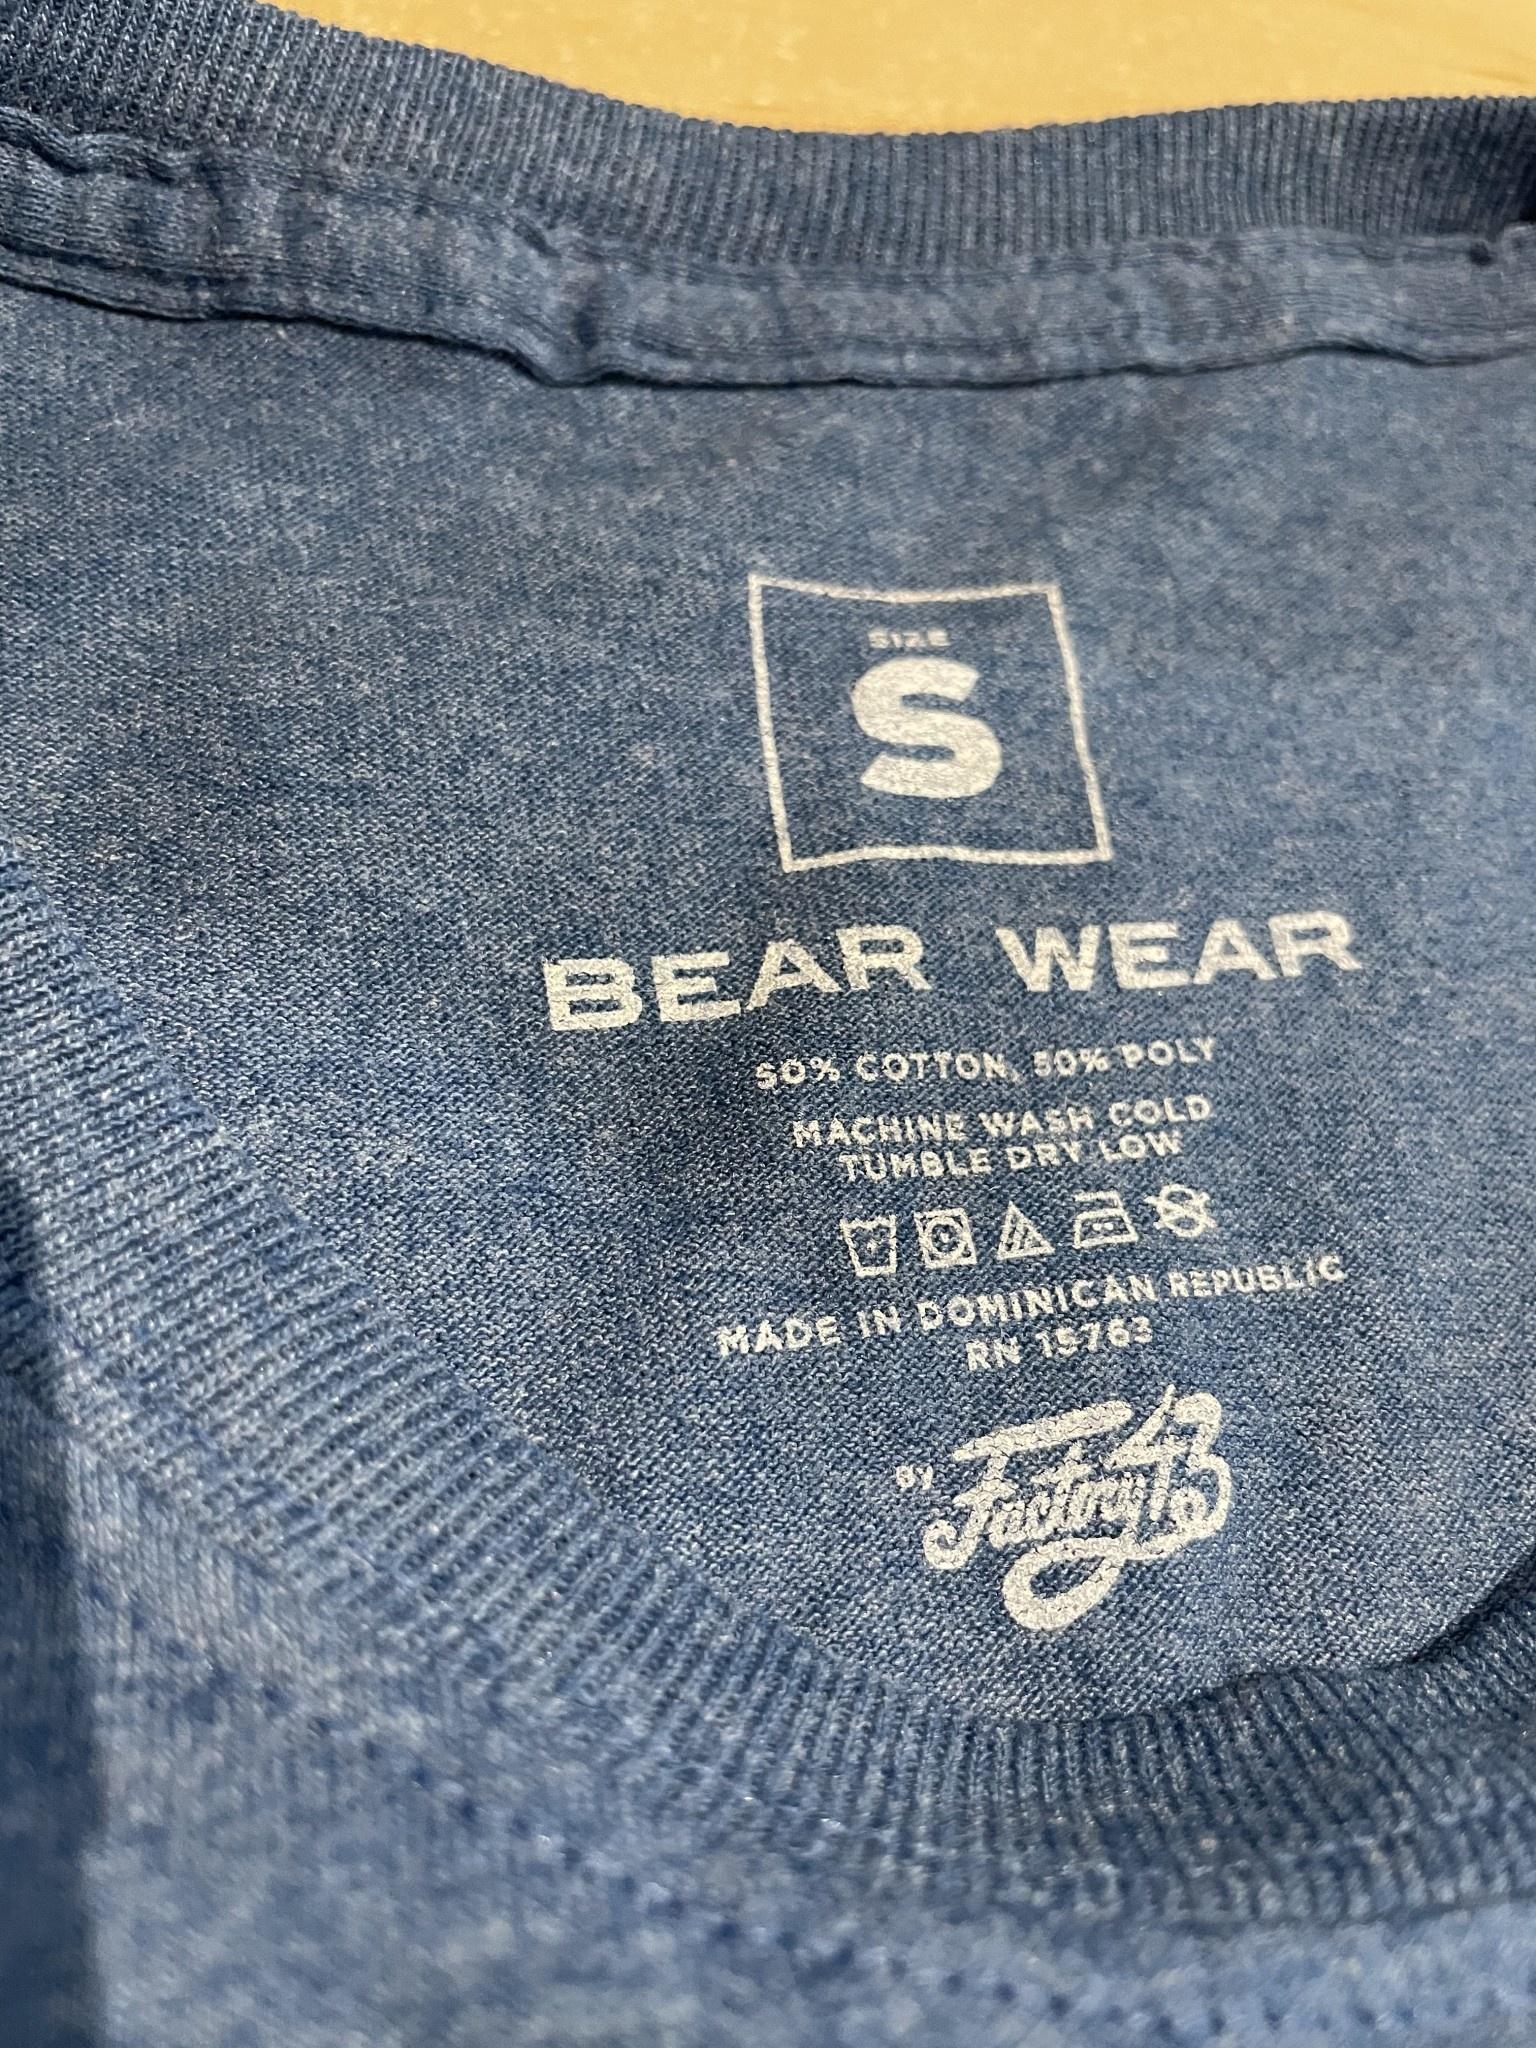 Bear Wear - Palm Springs Shirt